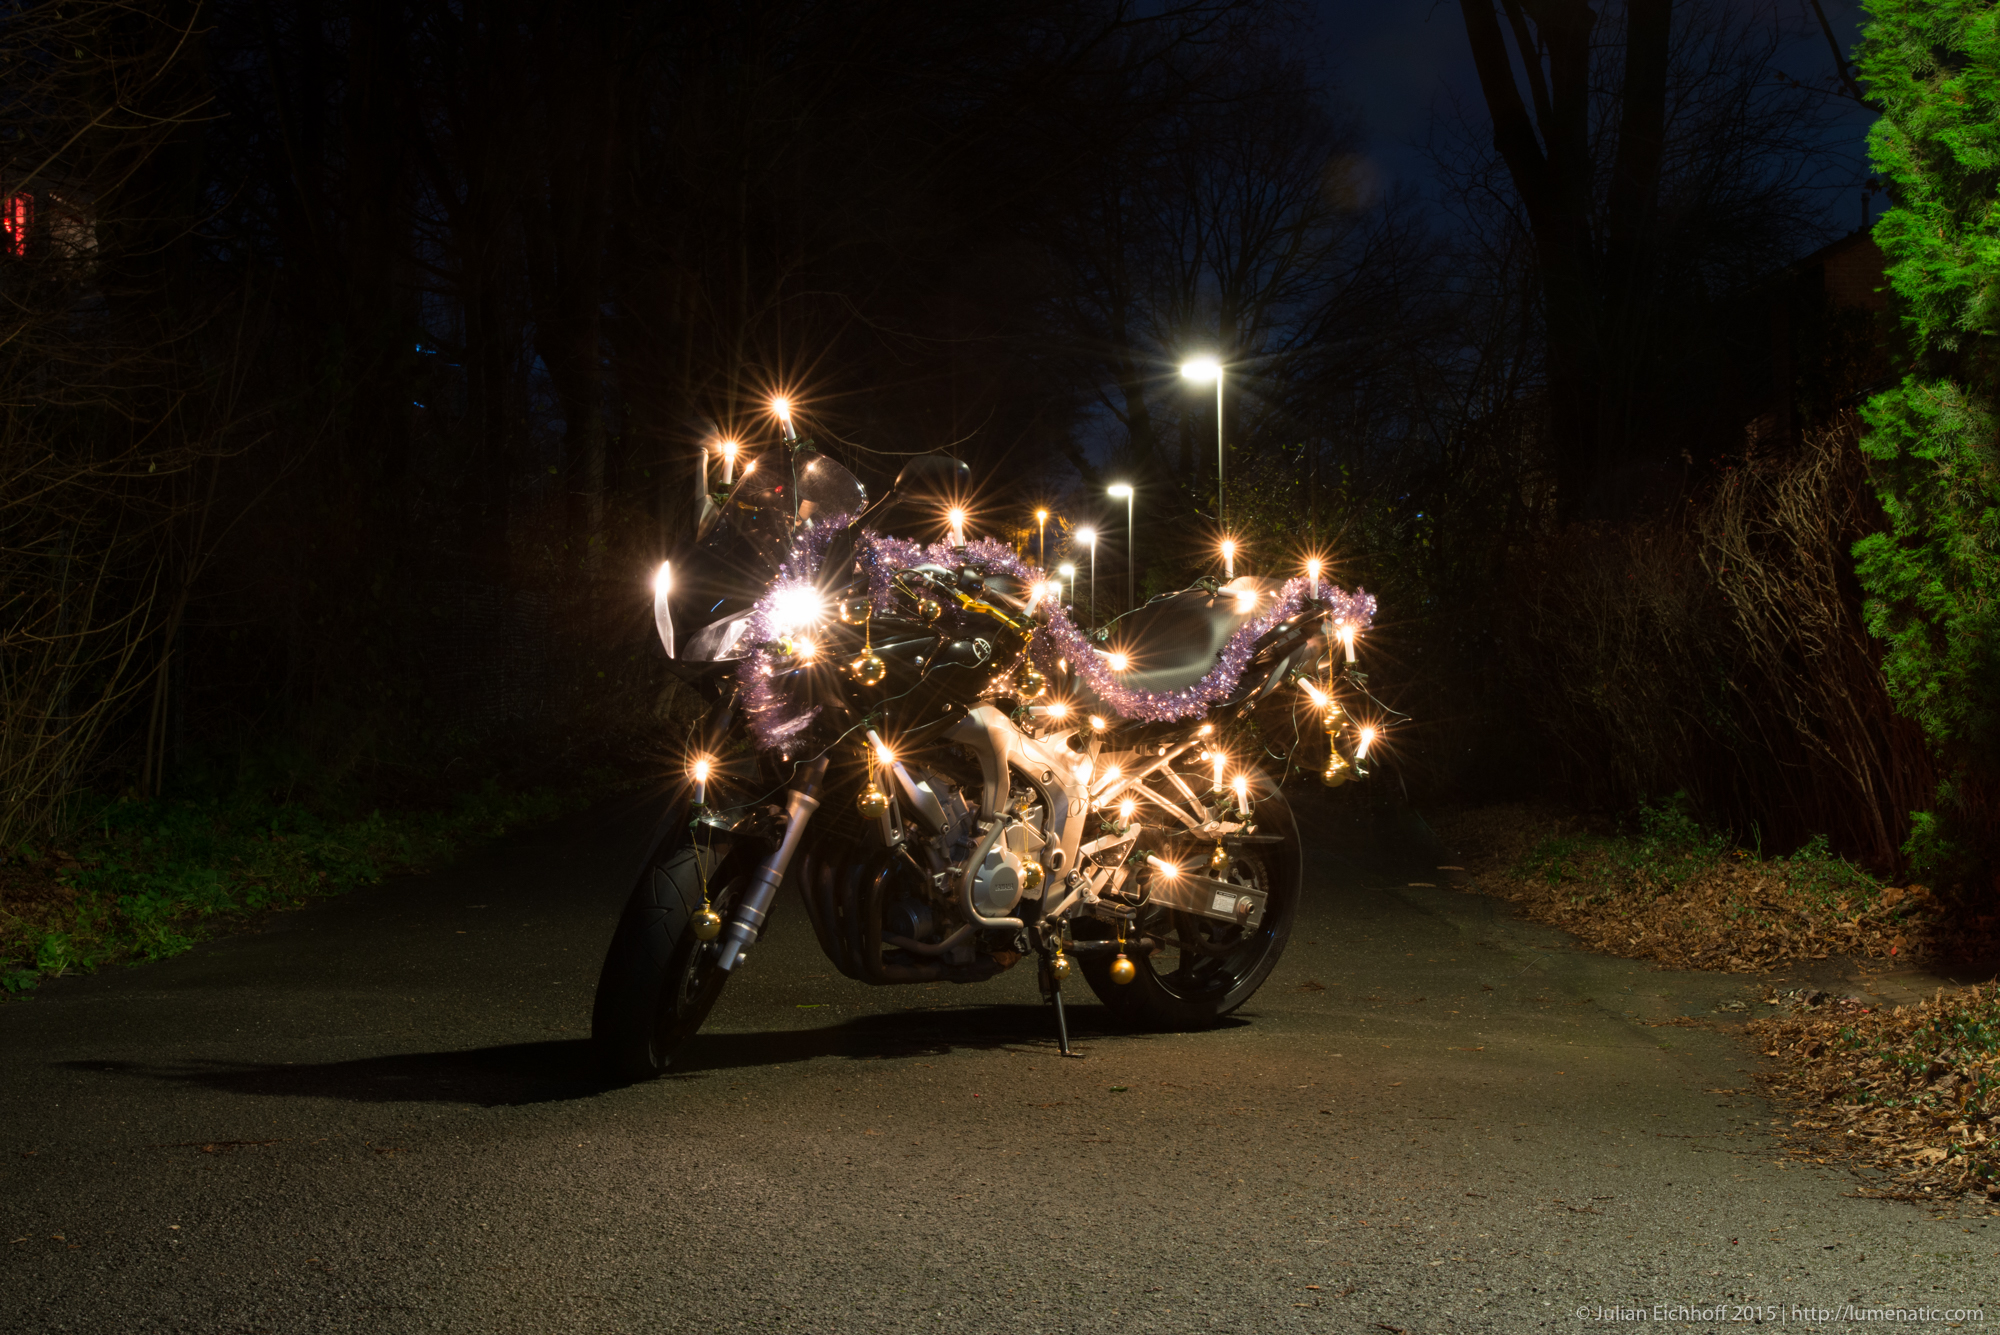 How the christmas motorbike photo was shot